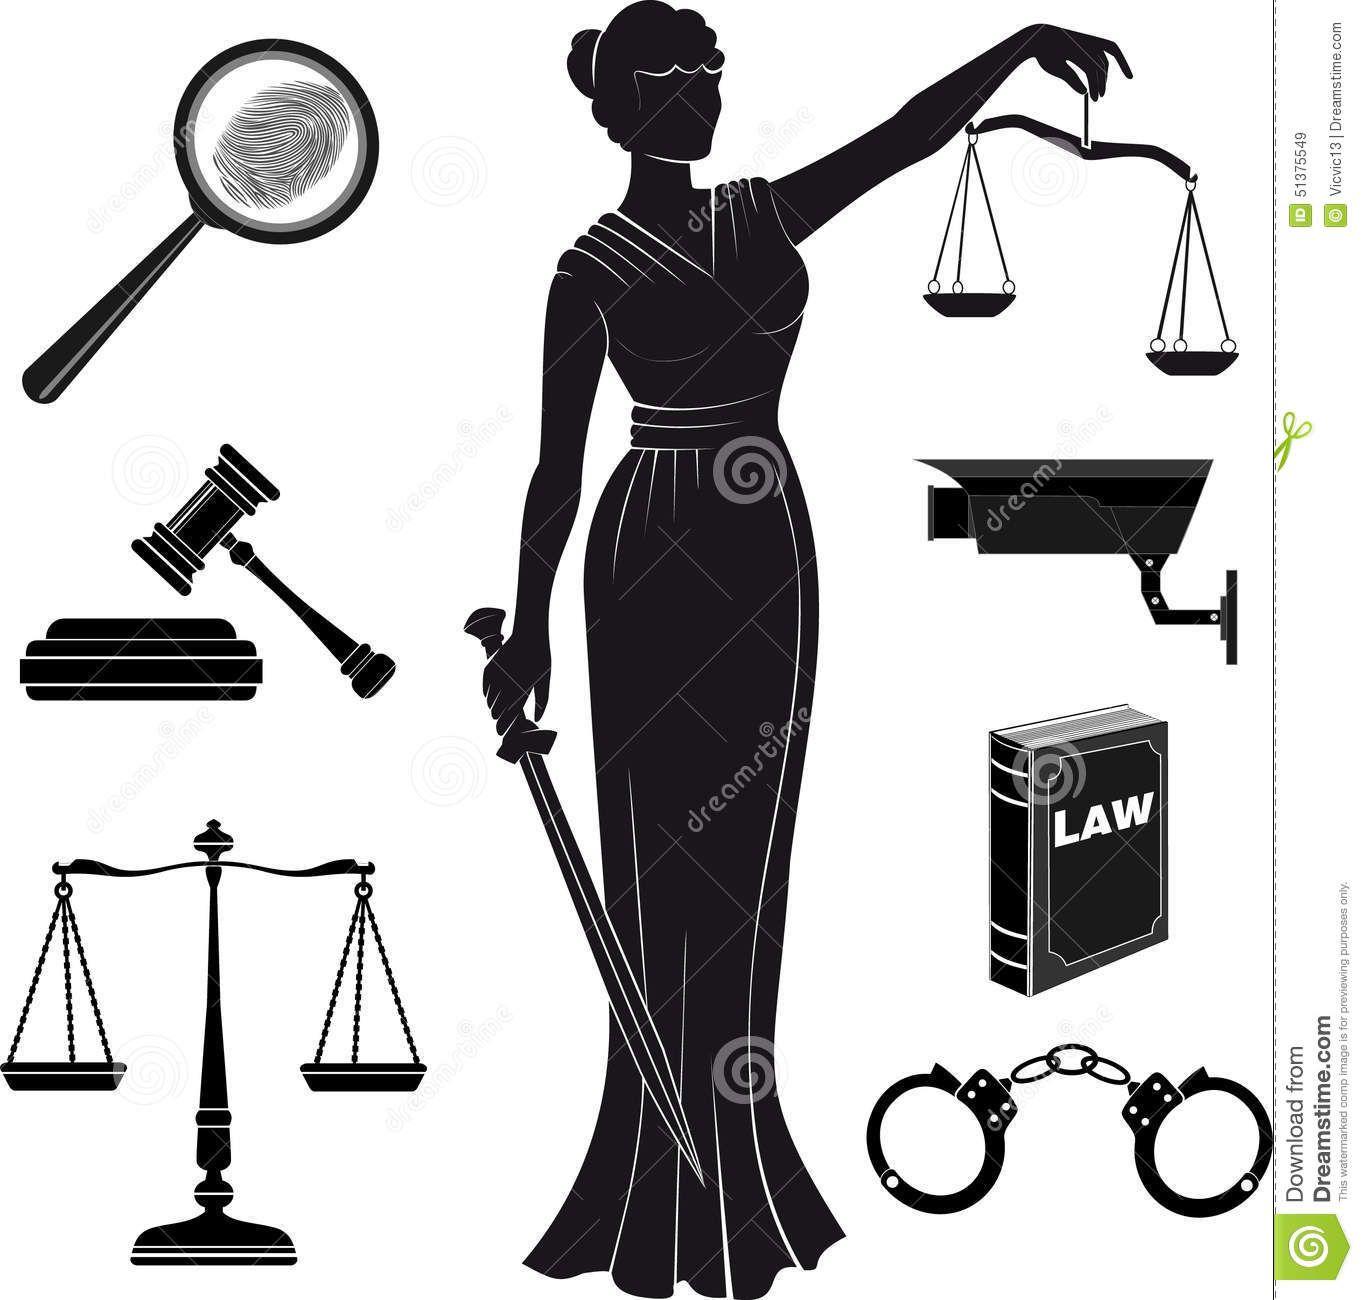 google justice pinterest google law studentscharcoal paintlady justiceegyptian tattooromanolibratattoo designssymbolssilhouette buycottarizona